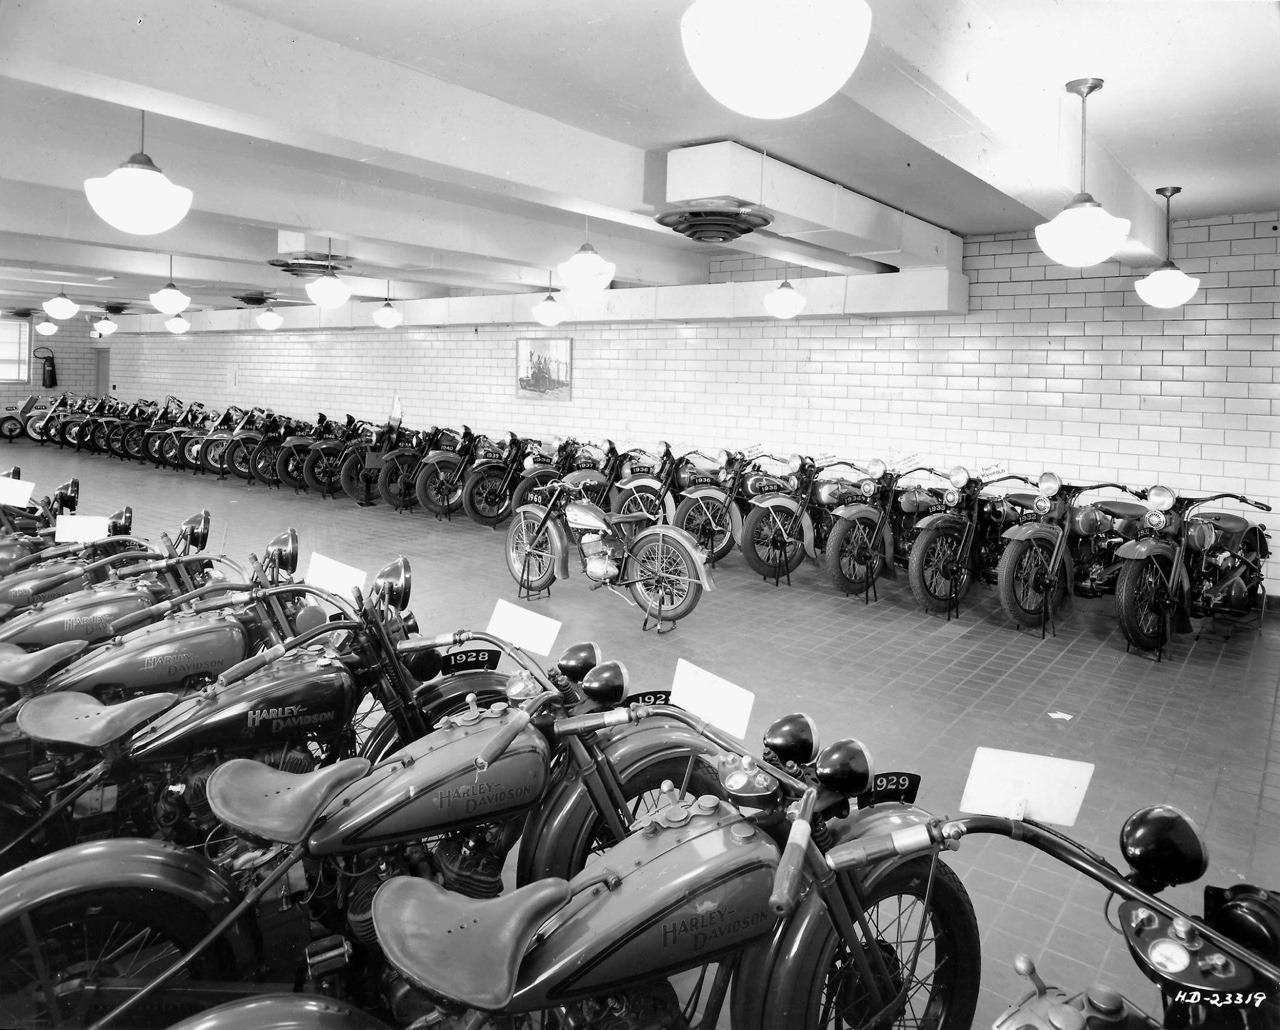 1958 - Posiblemente, el primer museo Harley-Davidson